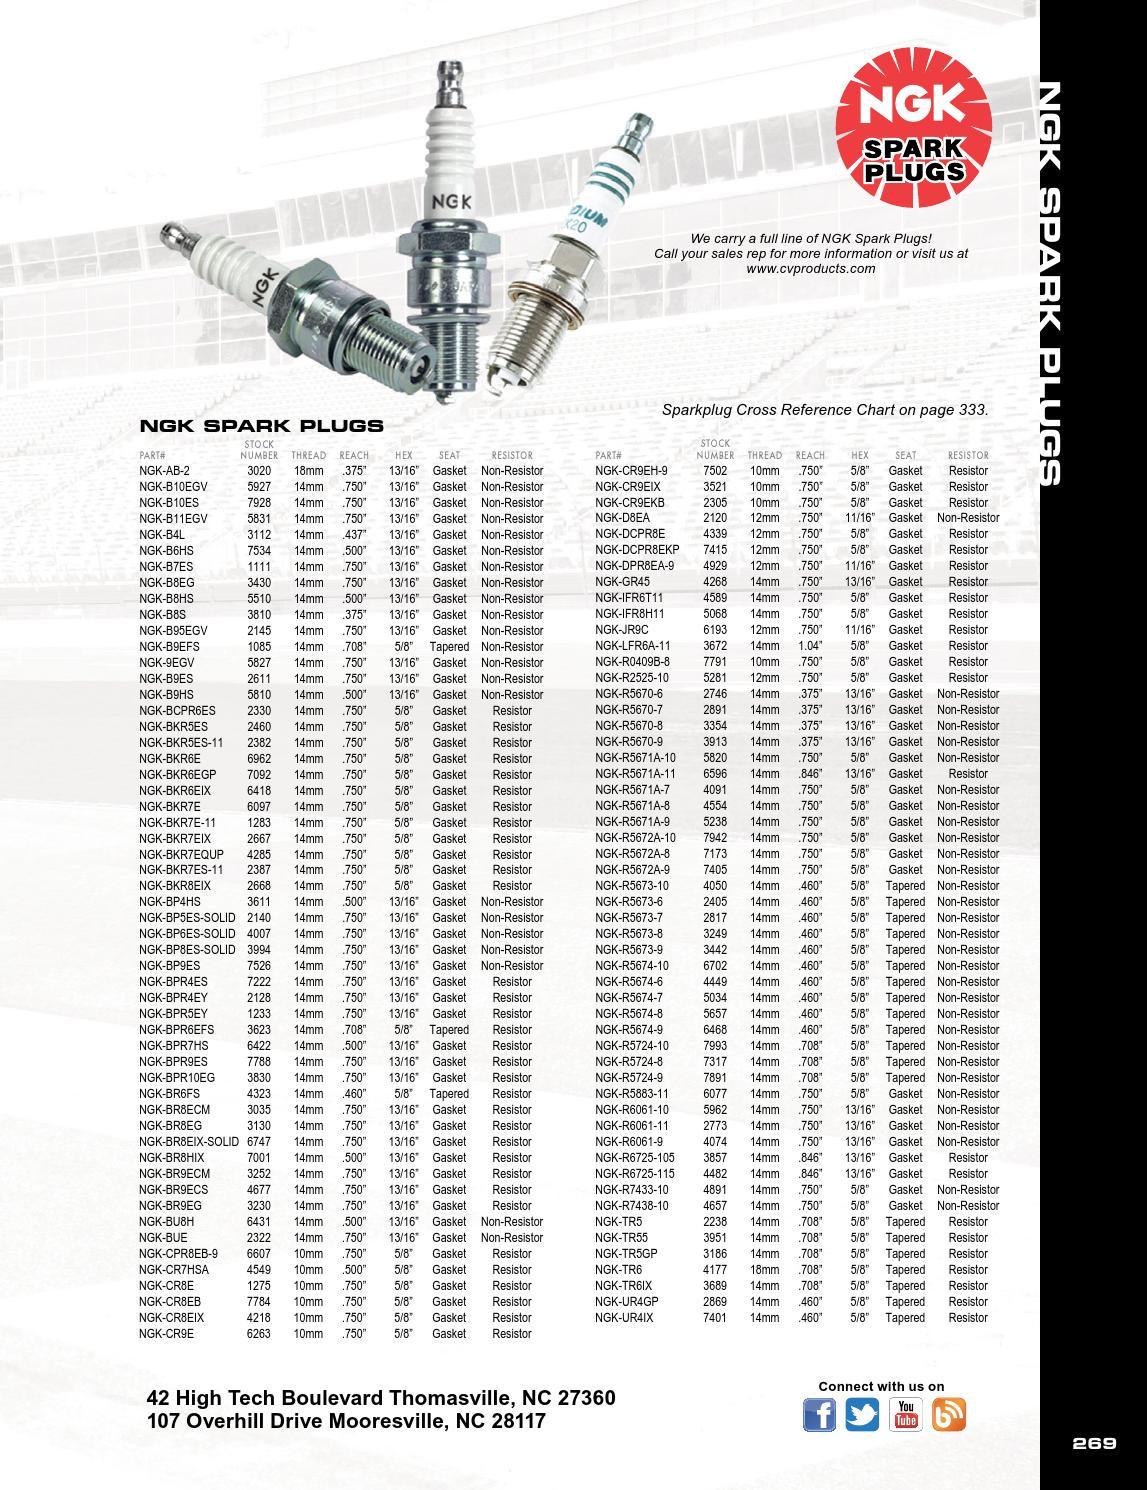 | Kawasaki KX 85/a peque/ño Rueda Kawasaki KX 125/K Buj/ía NGK r6252/K de 105 | Kawasaki KX 80/W peque/&ntild Kawasaki KX 80/R peque/ño Rueda VPE 1/para KAWASAKI KX 125/J Kawasaki KX 80/R